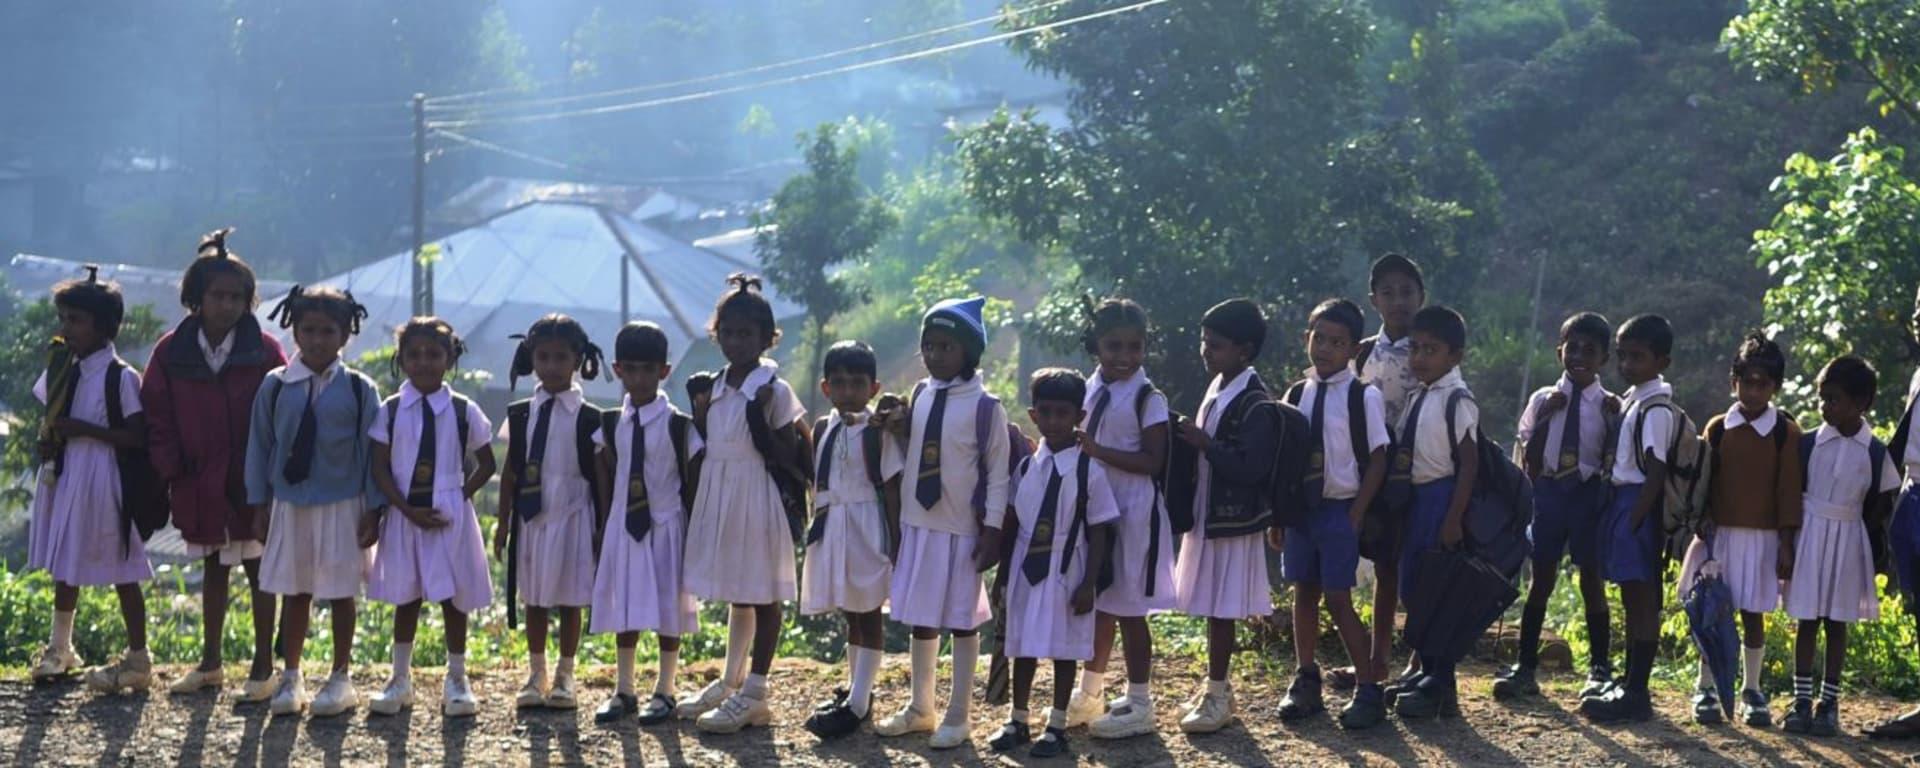 Voyages en Sri Lanka | Vacances en Asie par tourasia: School kids